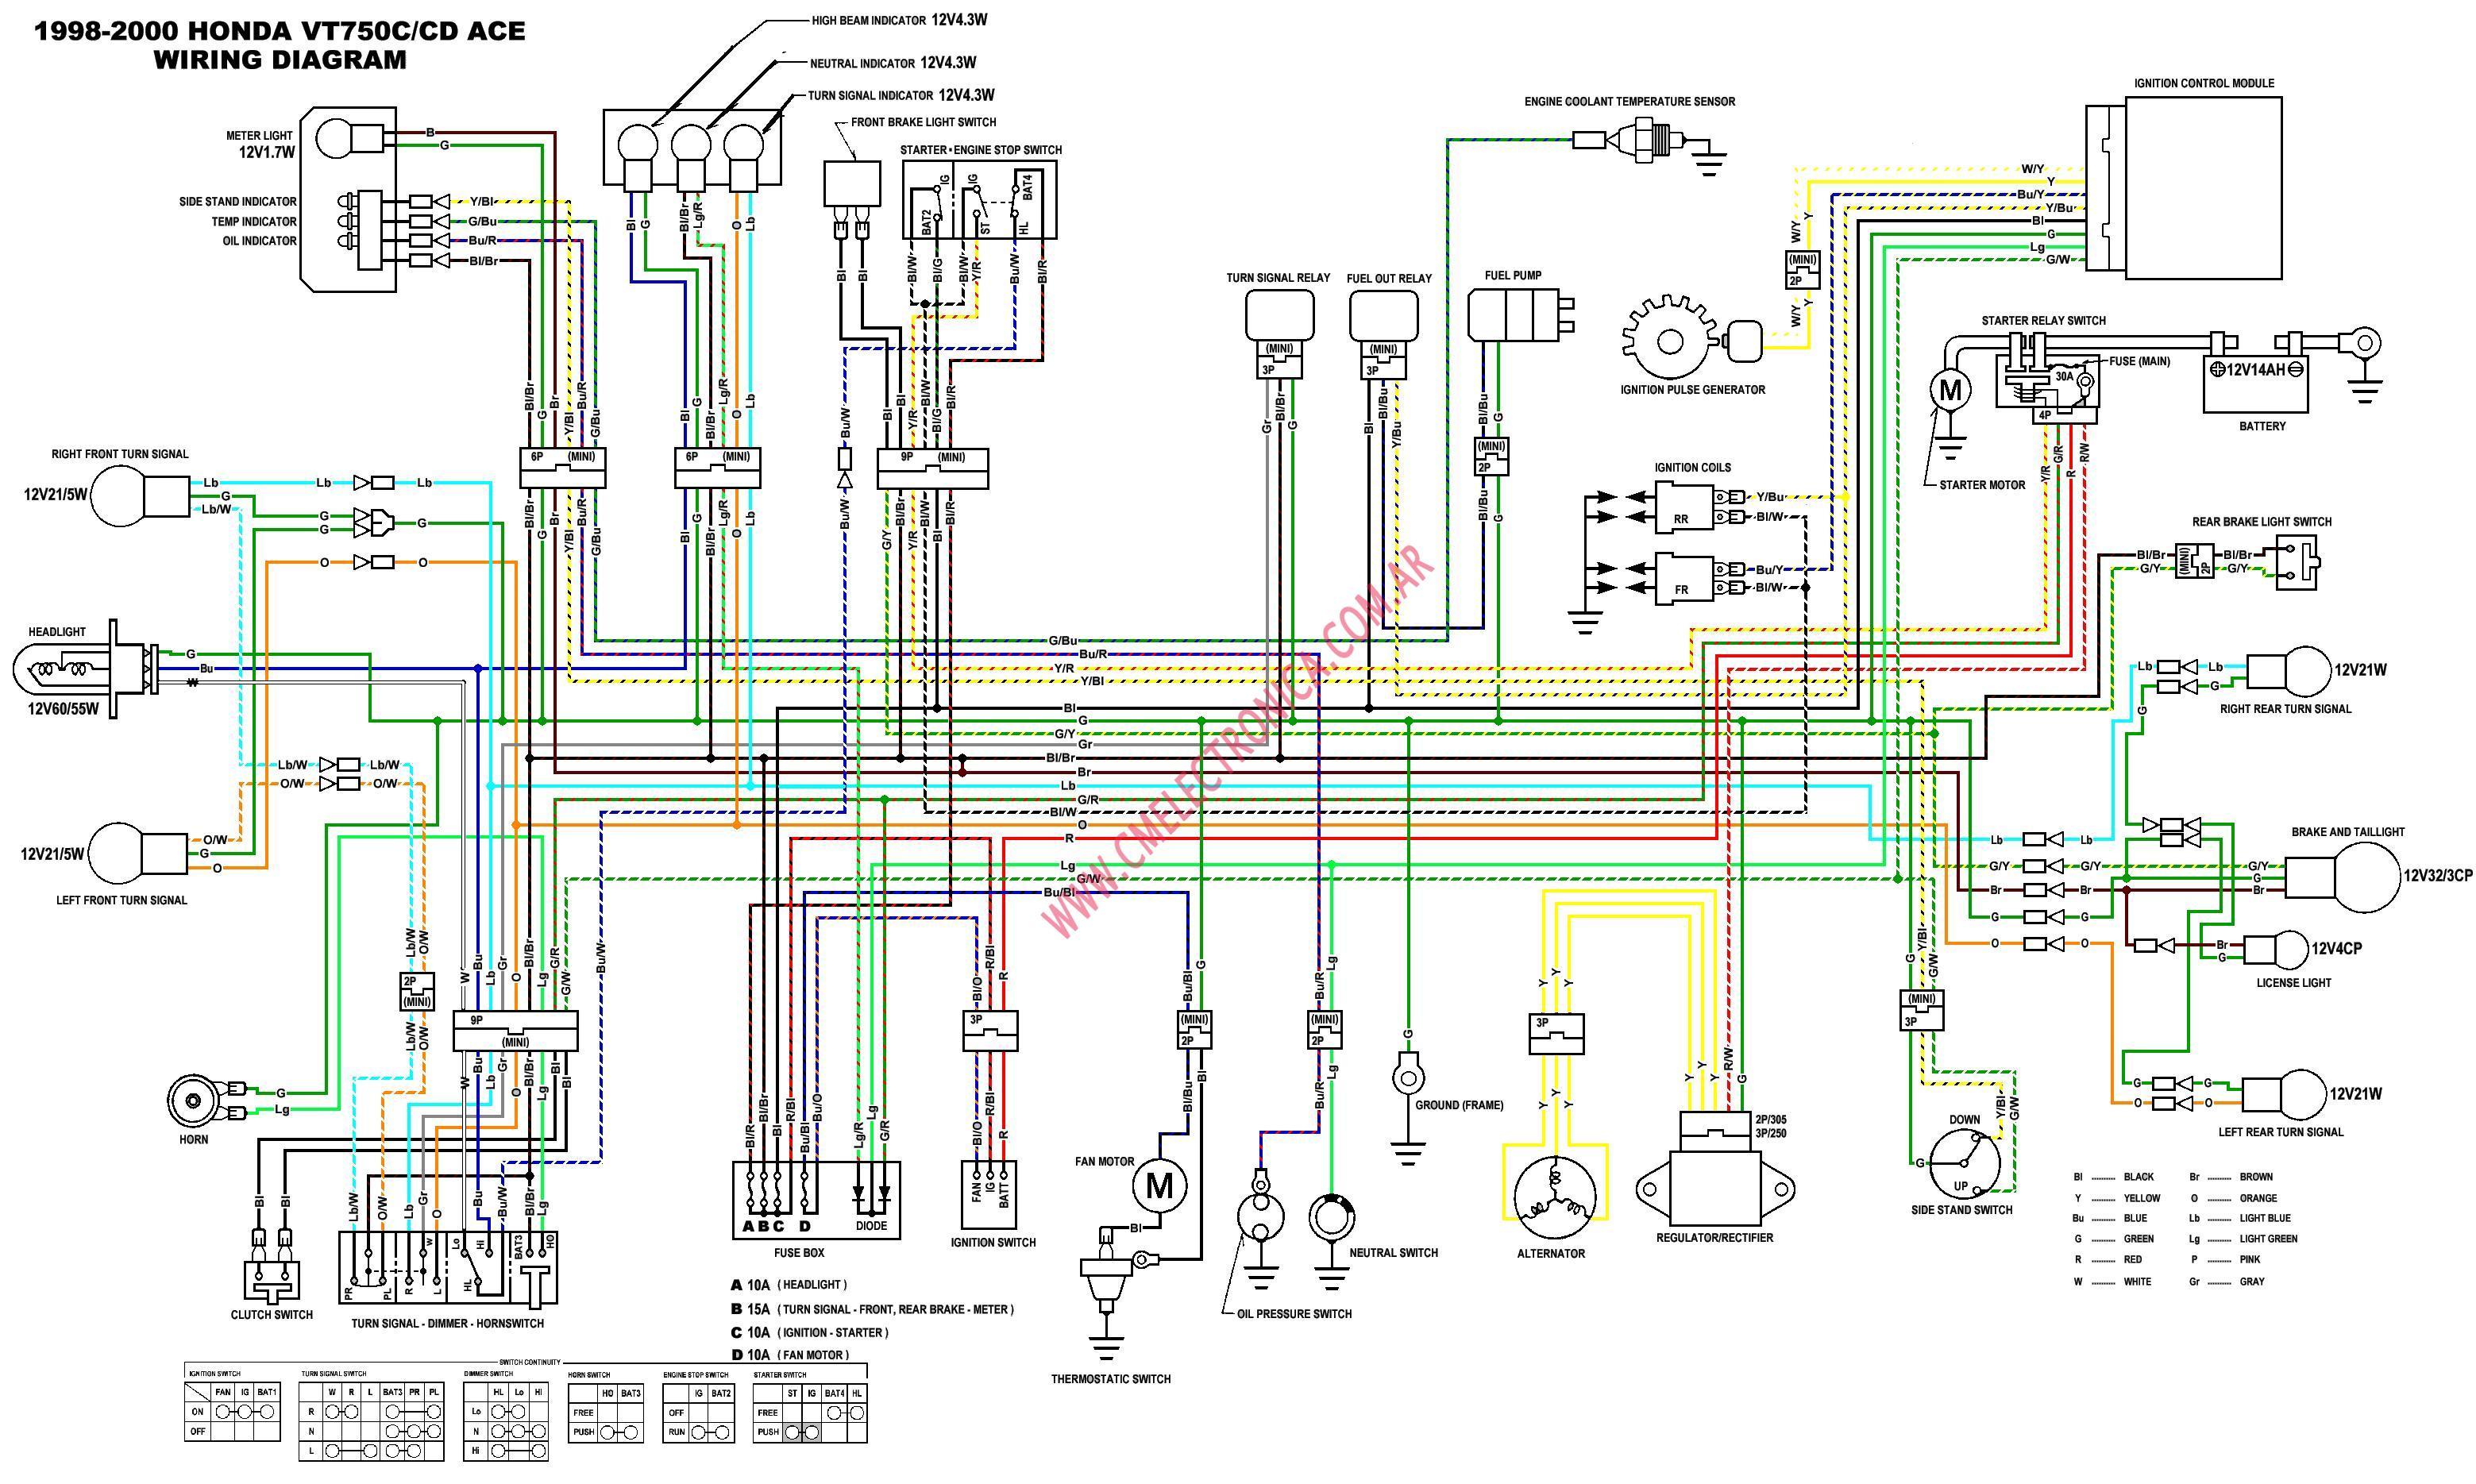 honda cl70 wiring all kind of wiring diagrams u2022 rh viewdress com